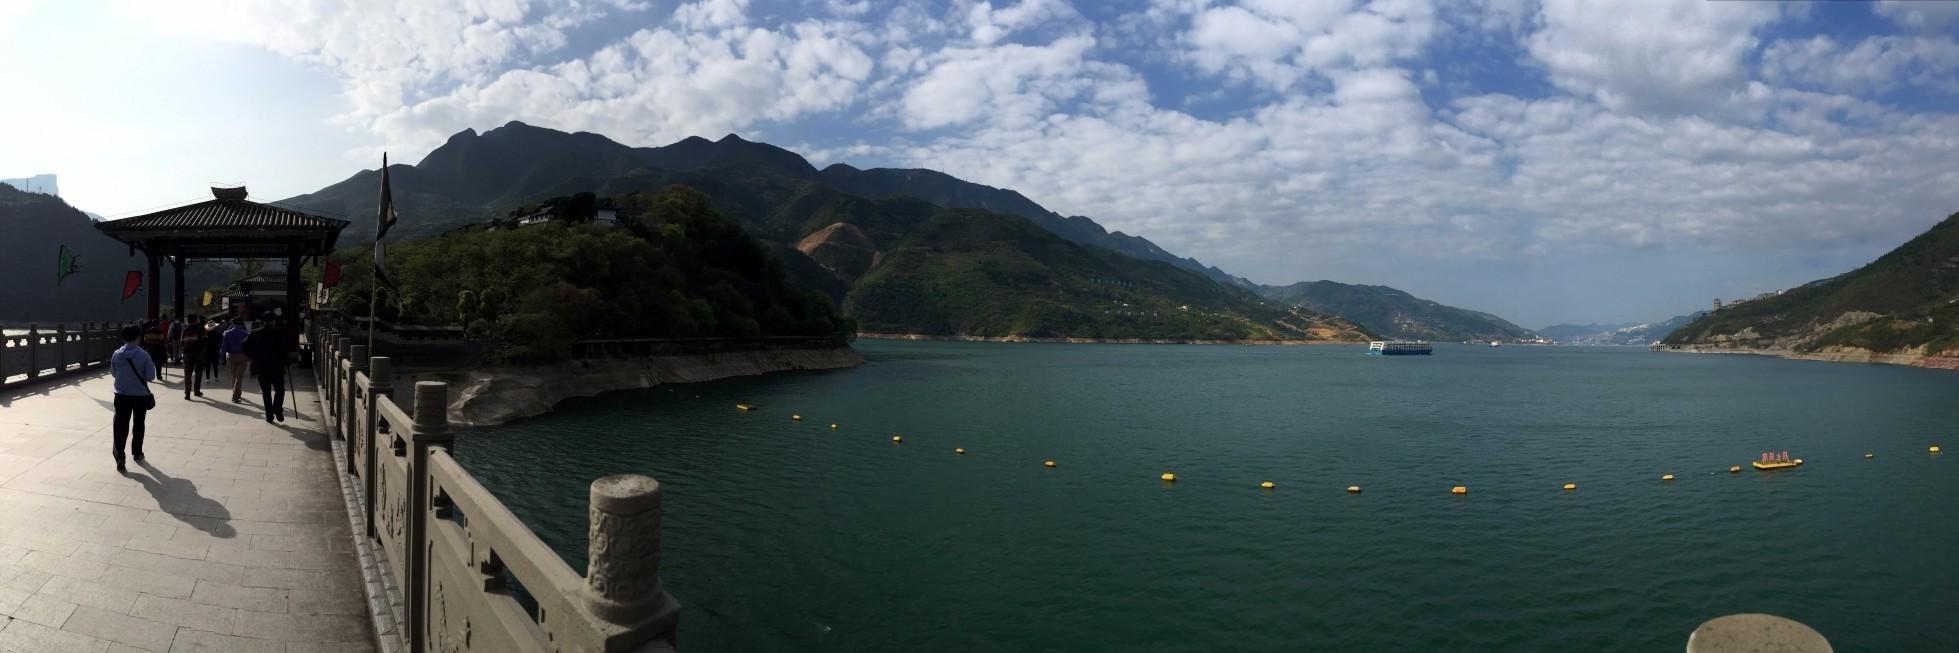 yangtze river cruise BaiDiCheng Panoramas